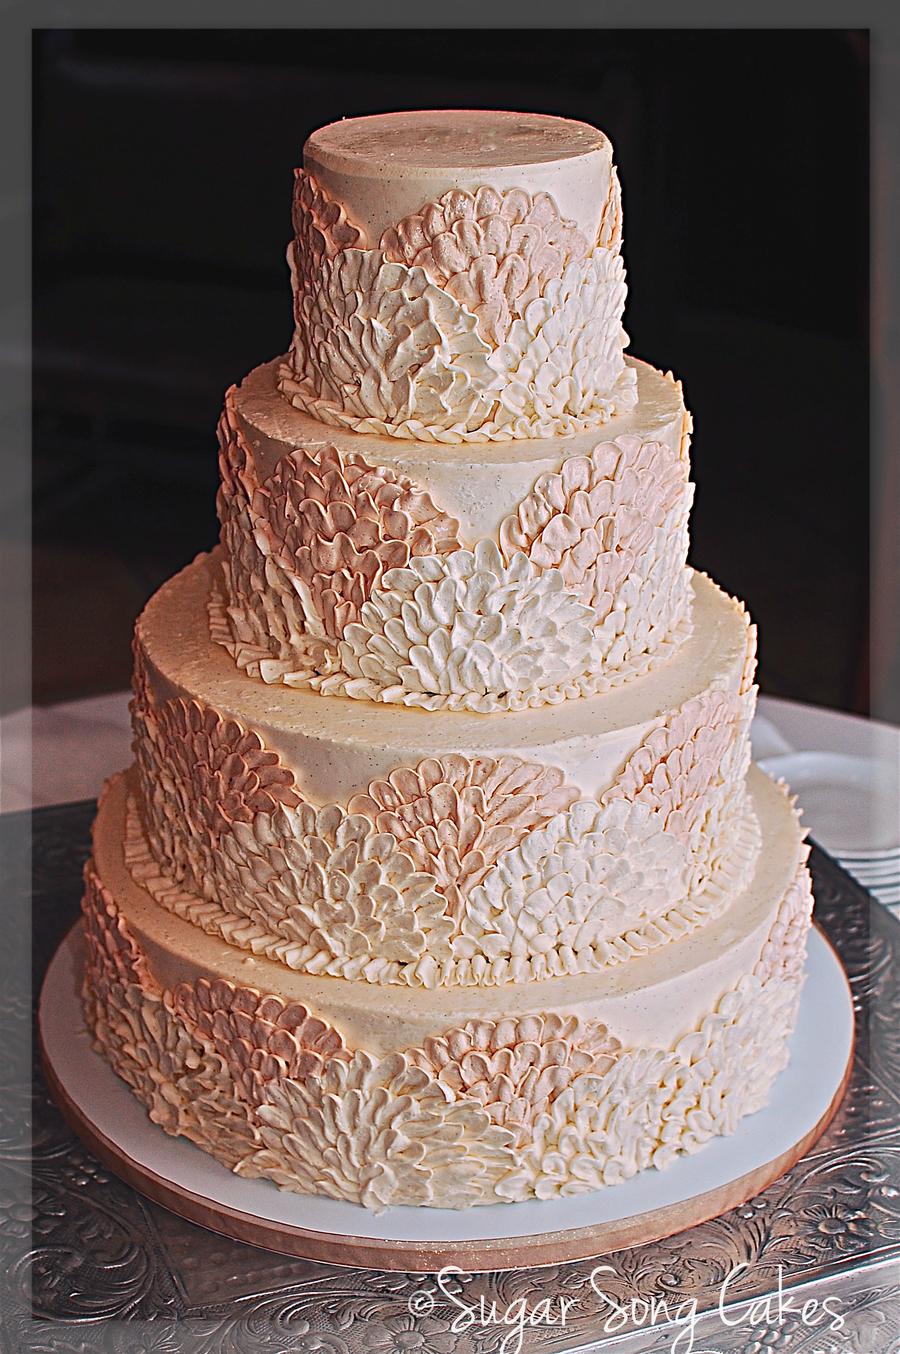 Buttercream Fan Wedding Cake - CakeCentral com